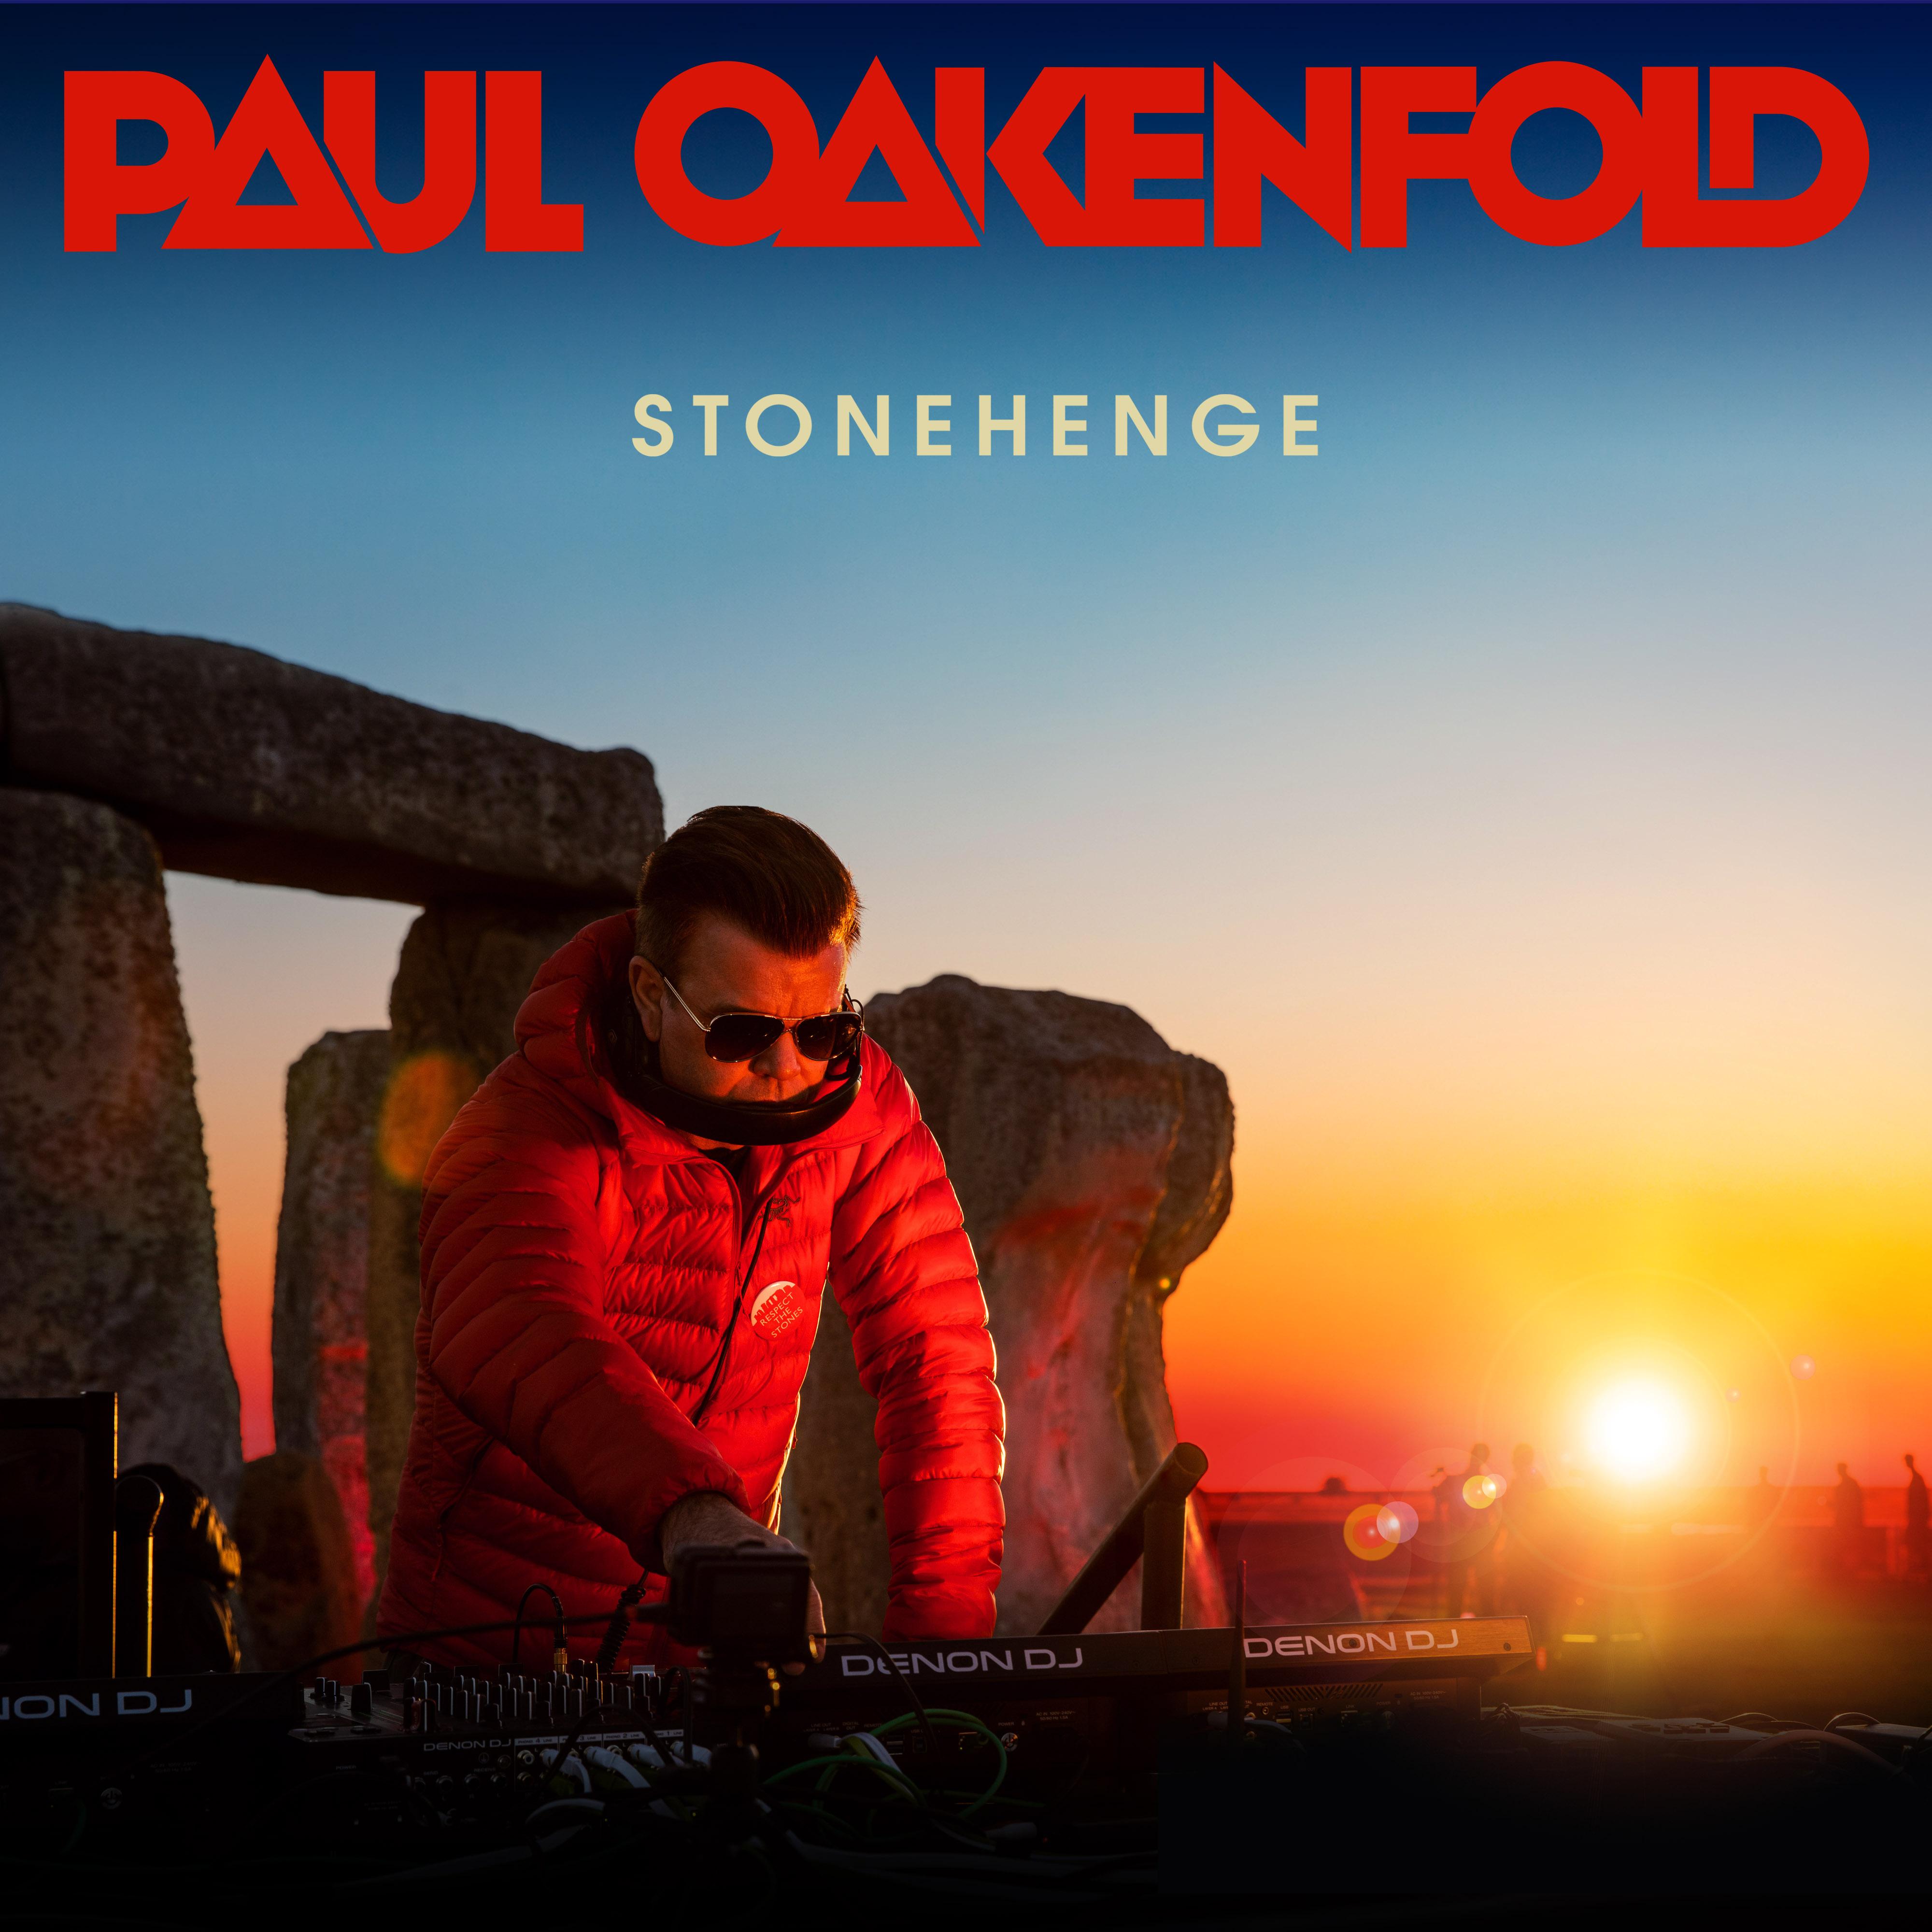 Paul Oakenfold - Sunset at Stonehenge